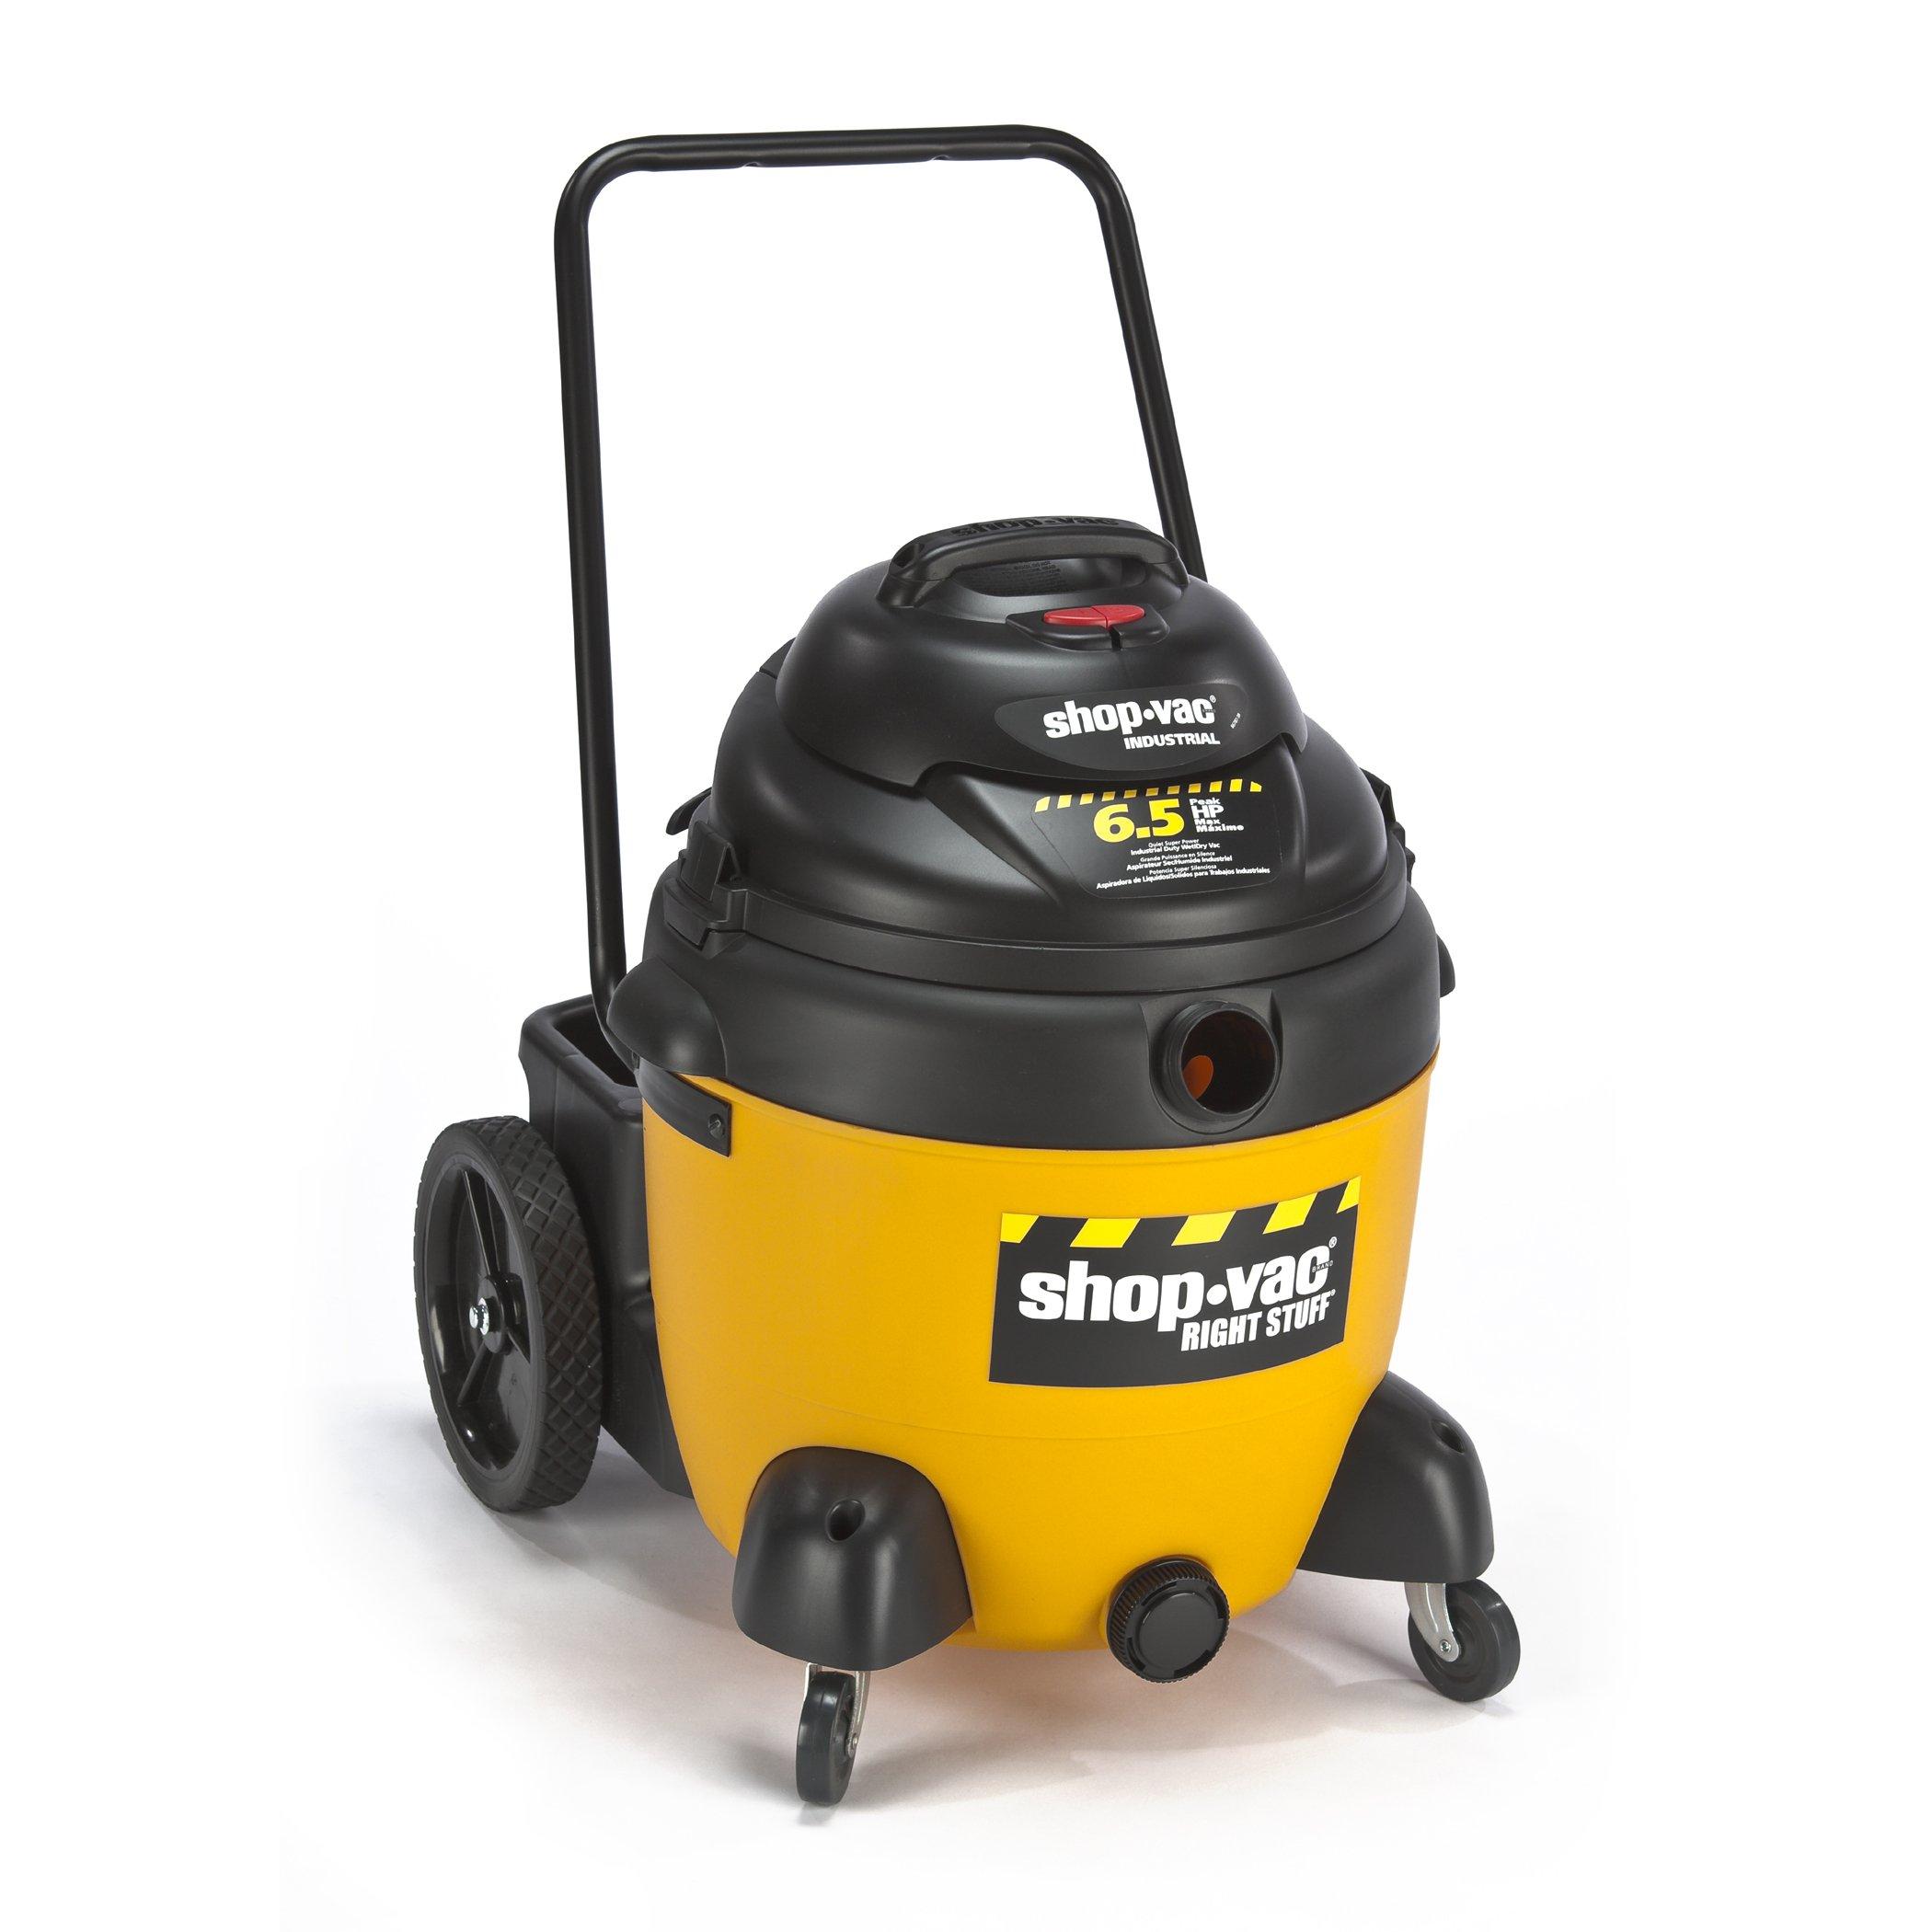 Shop-Vac 9625710 6.5-Peak Horsepower Right Stuff Wet/Dry Vacuum, 18-Gallon by Shop-Vac (Image #1)